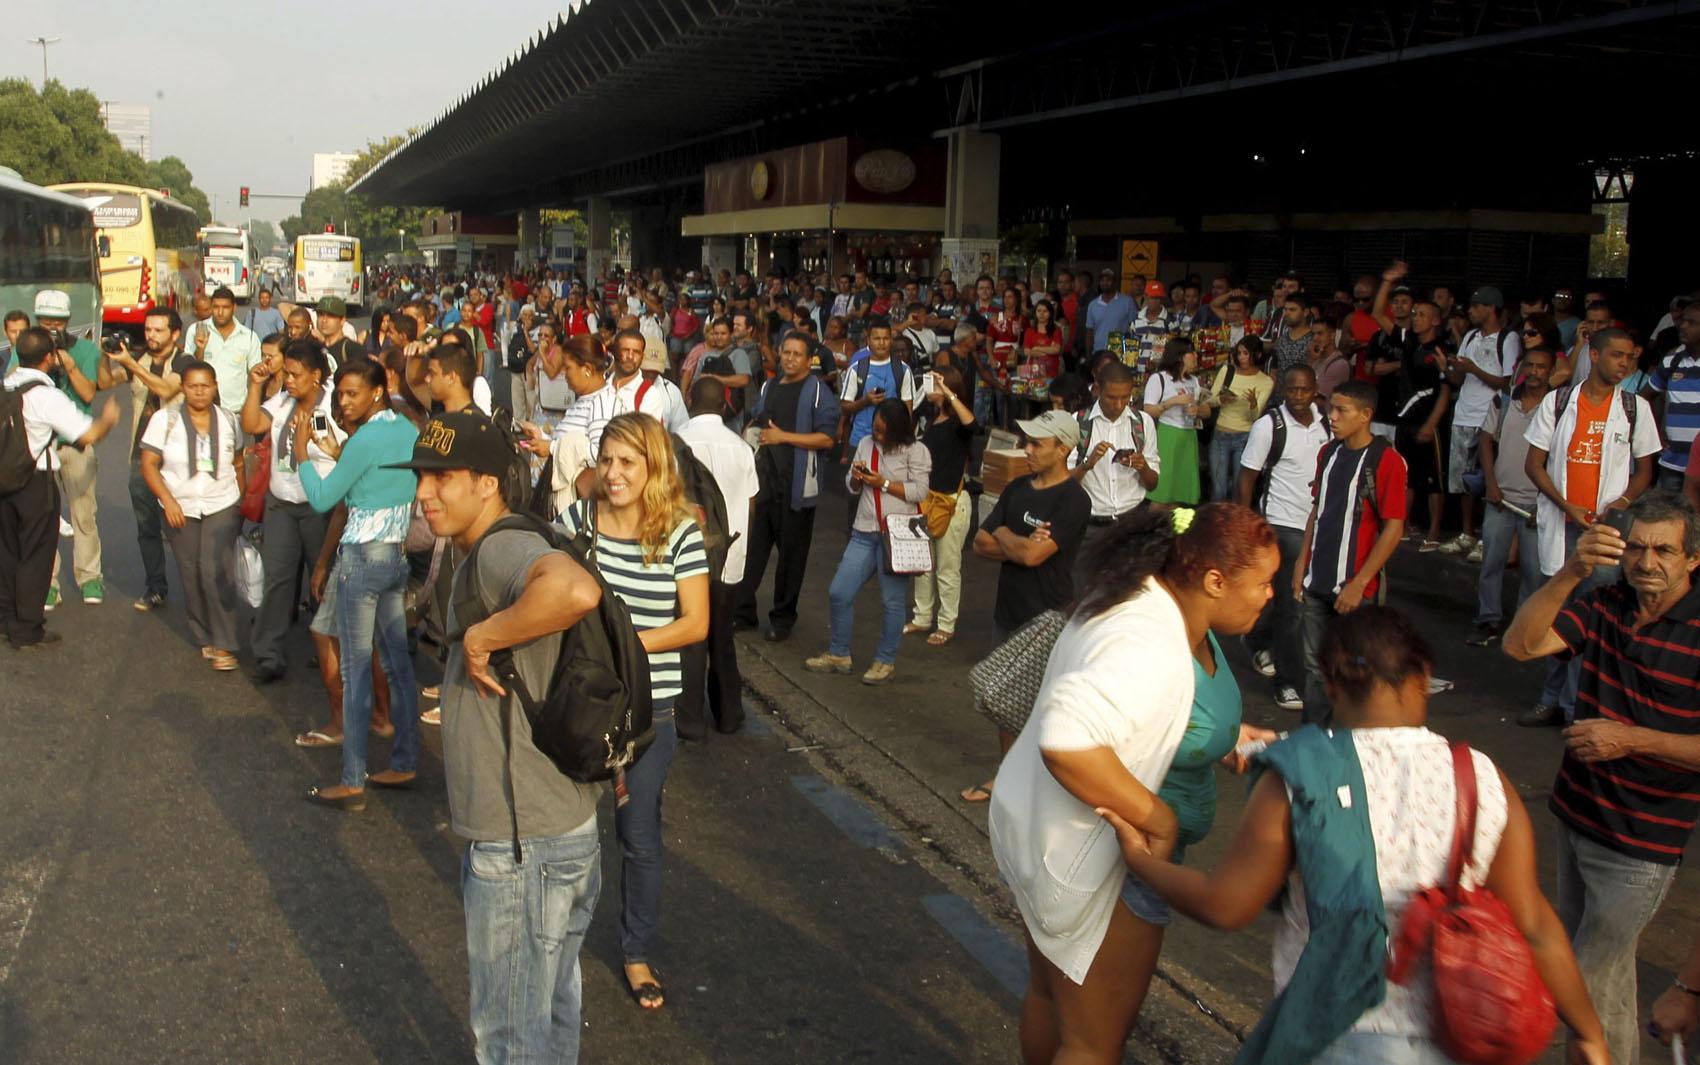 Passageiros que aguardavam ônibus na Av Presidente Vargas, ao lado da Central do Brasil, fecham a pista lateral de descida sentido zona norte